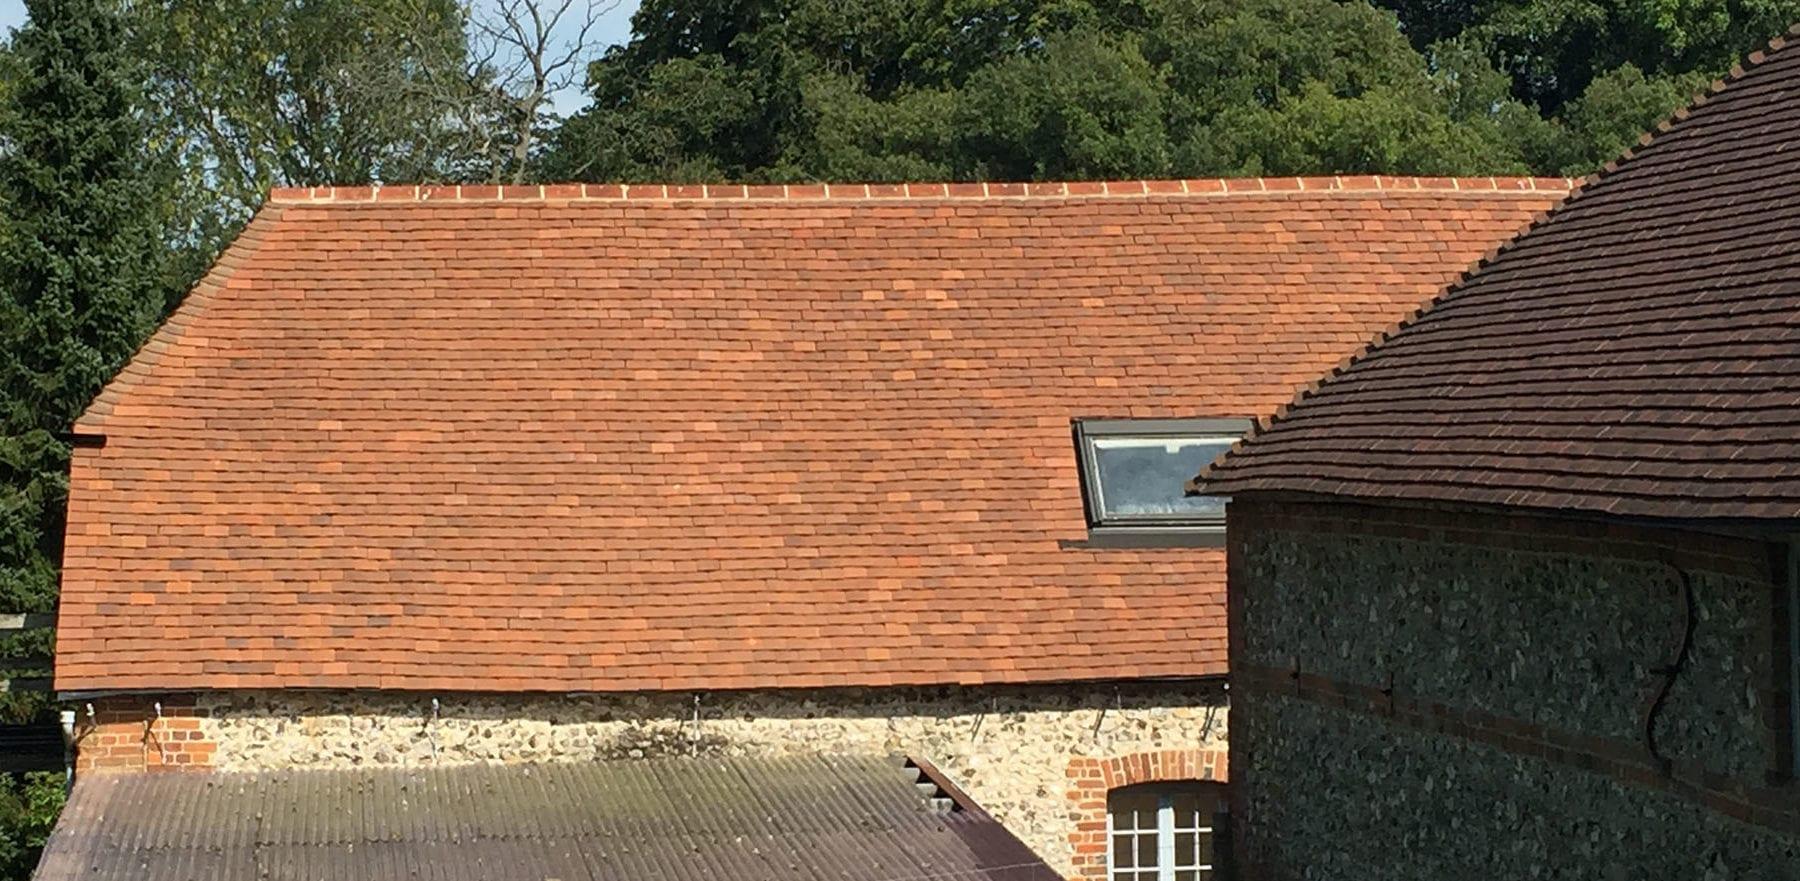 Lifestiles - Handmade Brown Clay Roof Tiles - Stockbridge, England 2